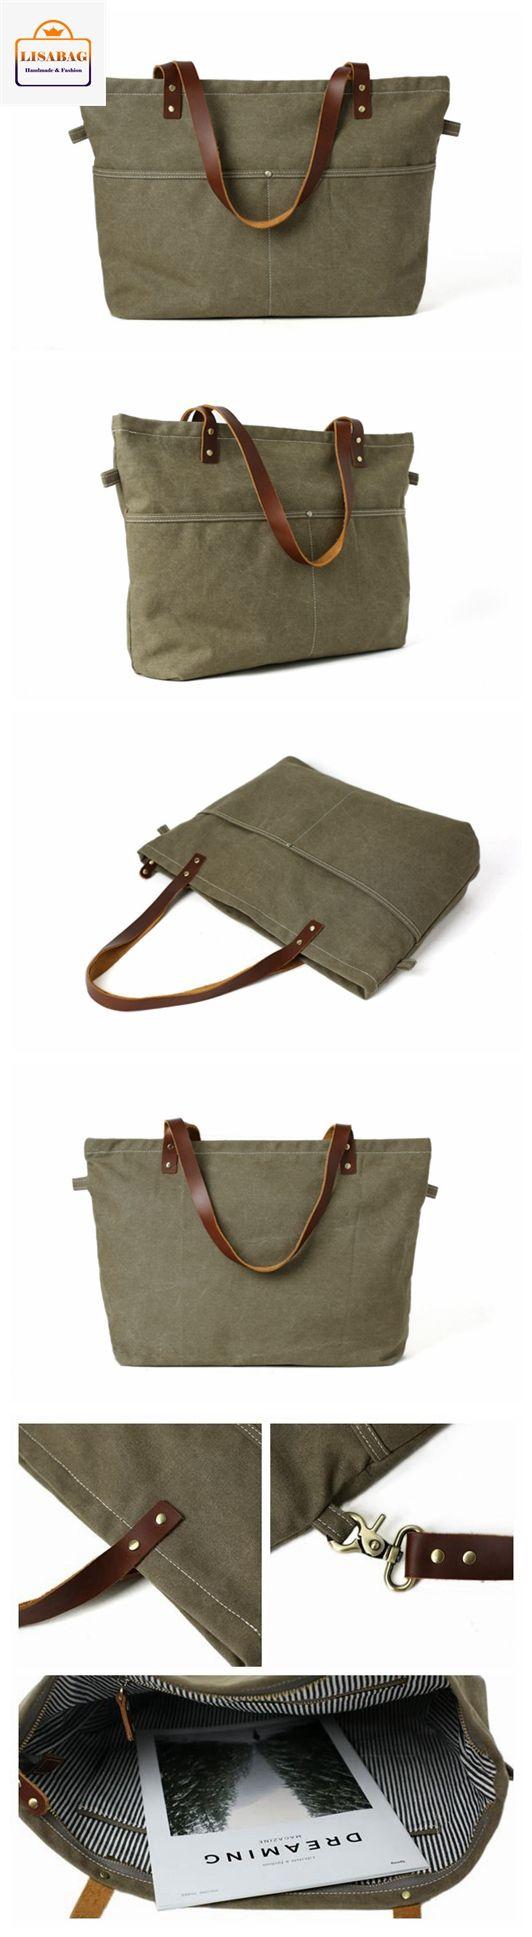 Handmade Army Green Canvas Tote Bag Messenger Bag Shopper Bag School Bag Handbag 14022